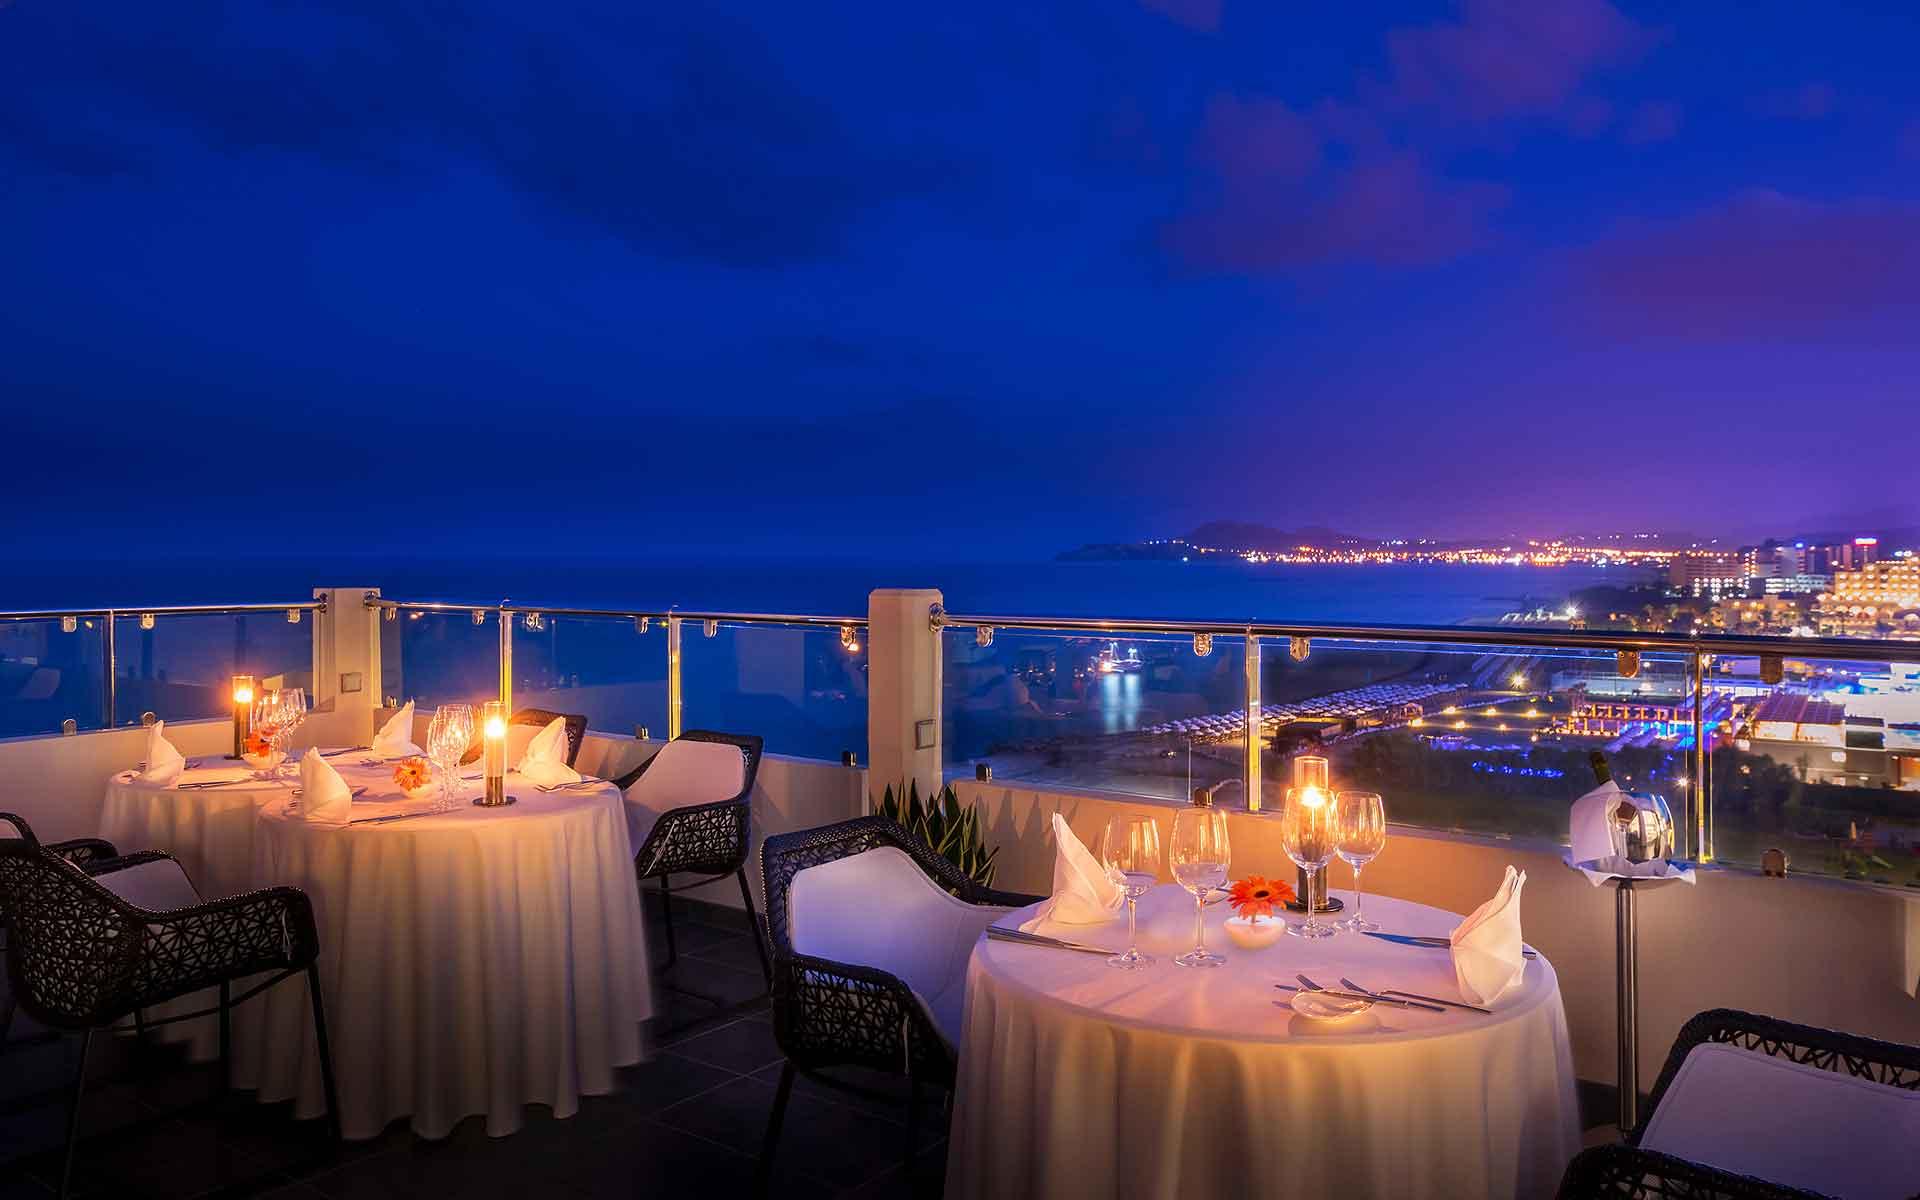 Noble_Gourmet_Restaurant_ELYSIUM_Rhodes_30